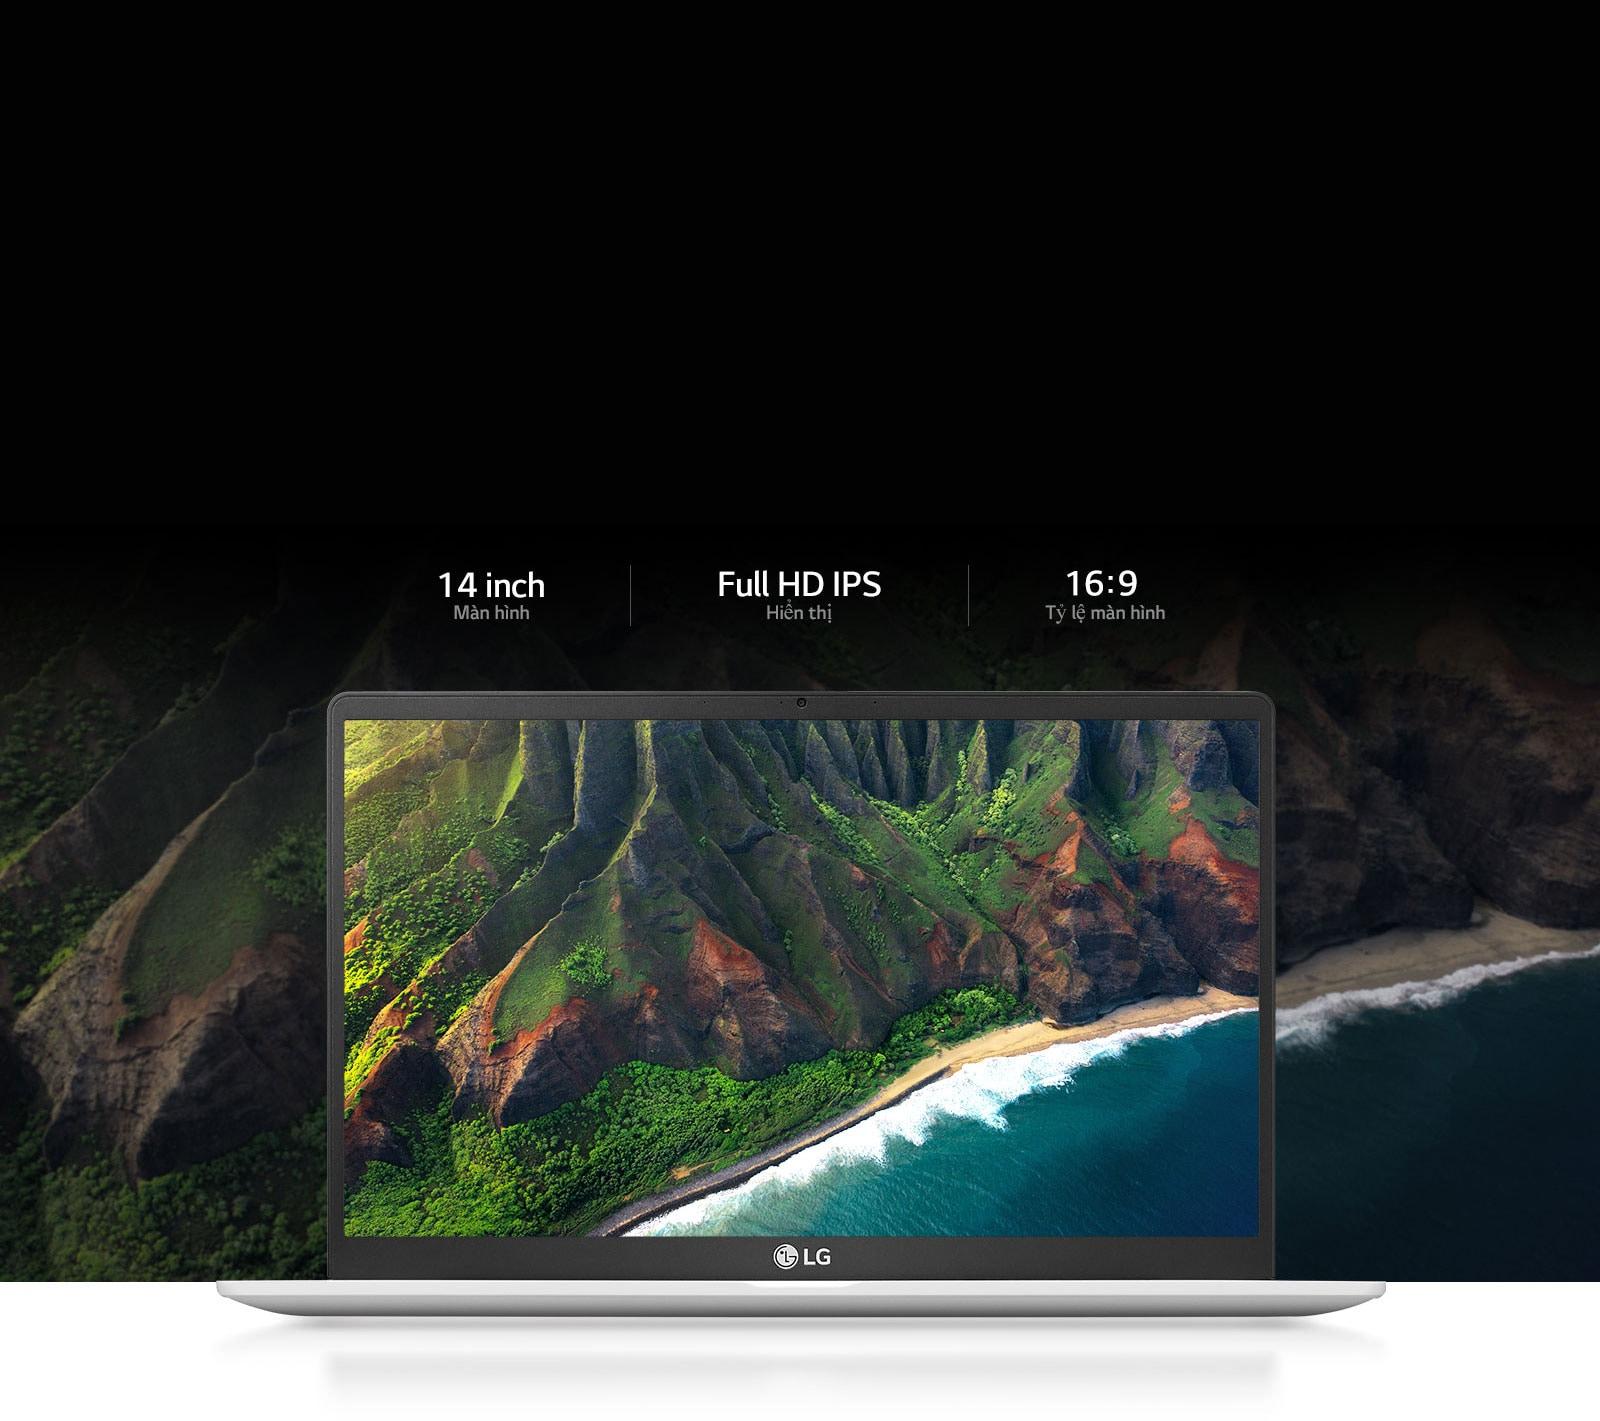 Hiển thị IPS Full HD